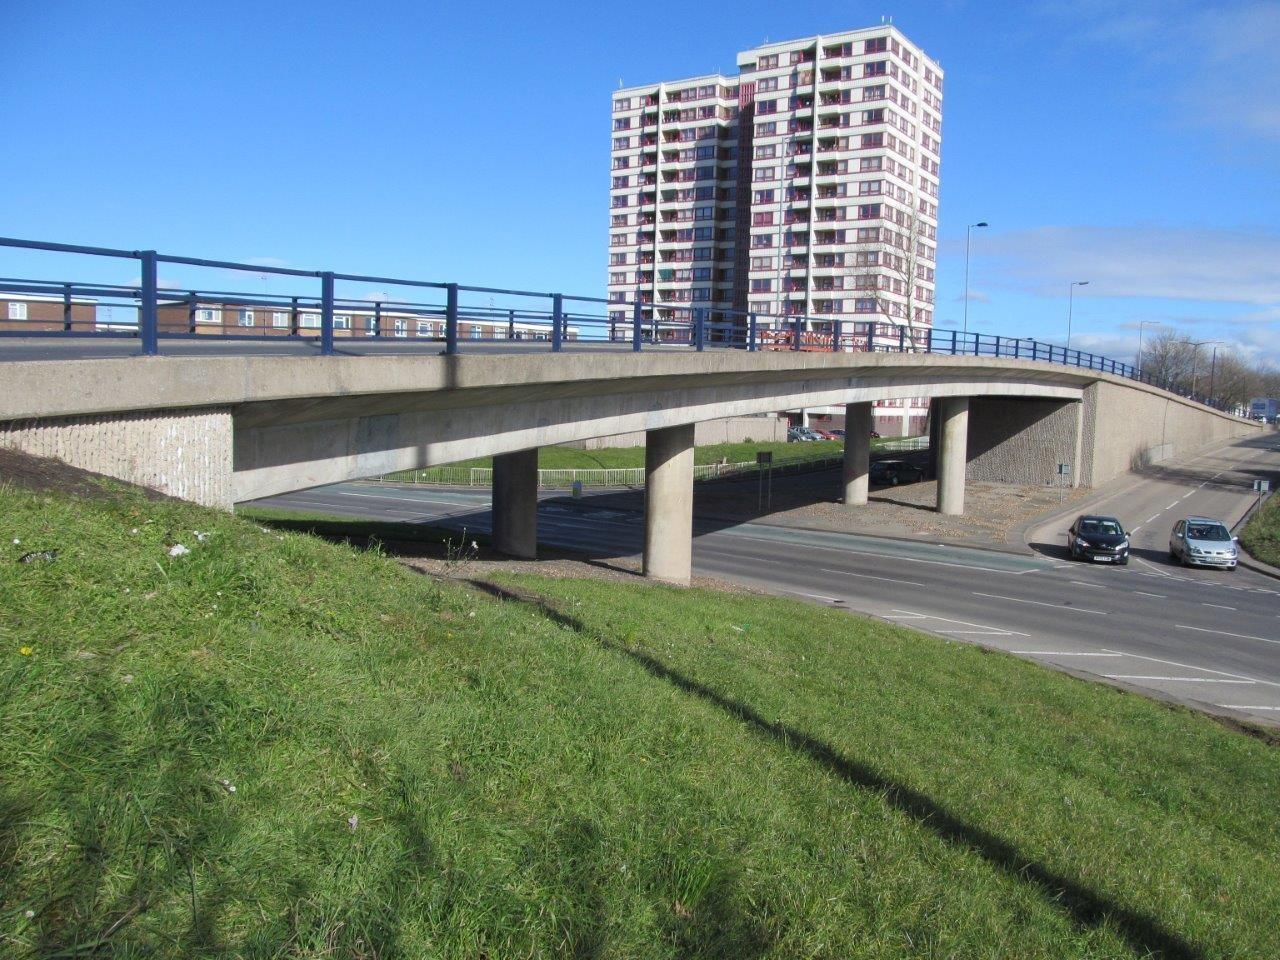 A flyover bridge in Balby.